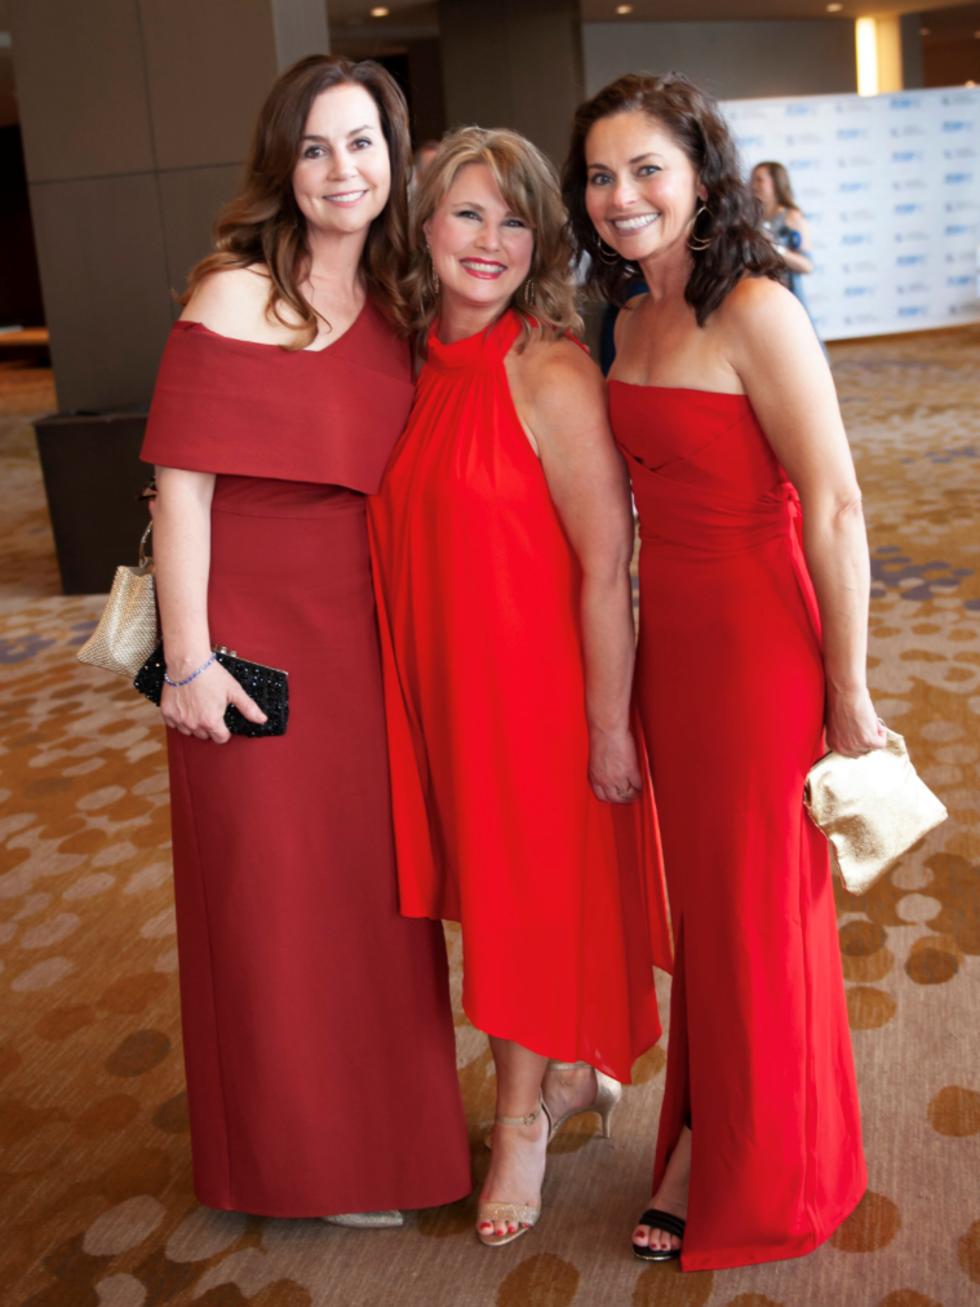 ElizabethBryant, Courtney De La Garza and Lesley Jordan